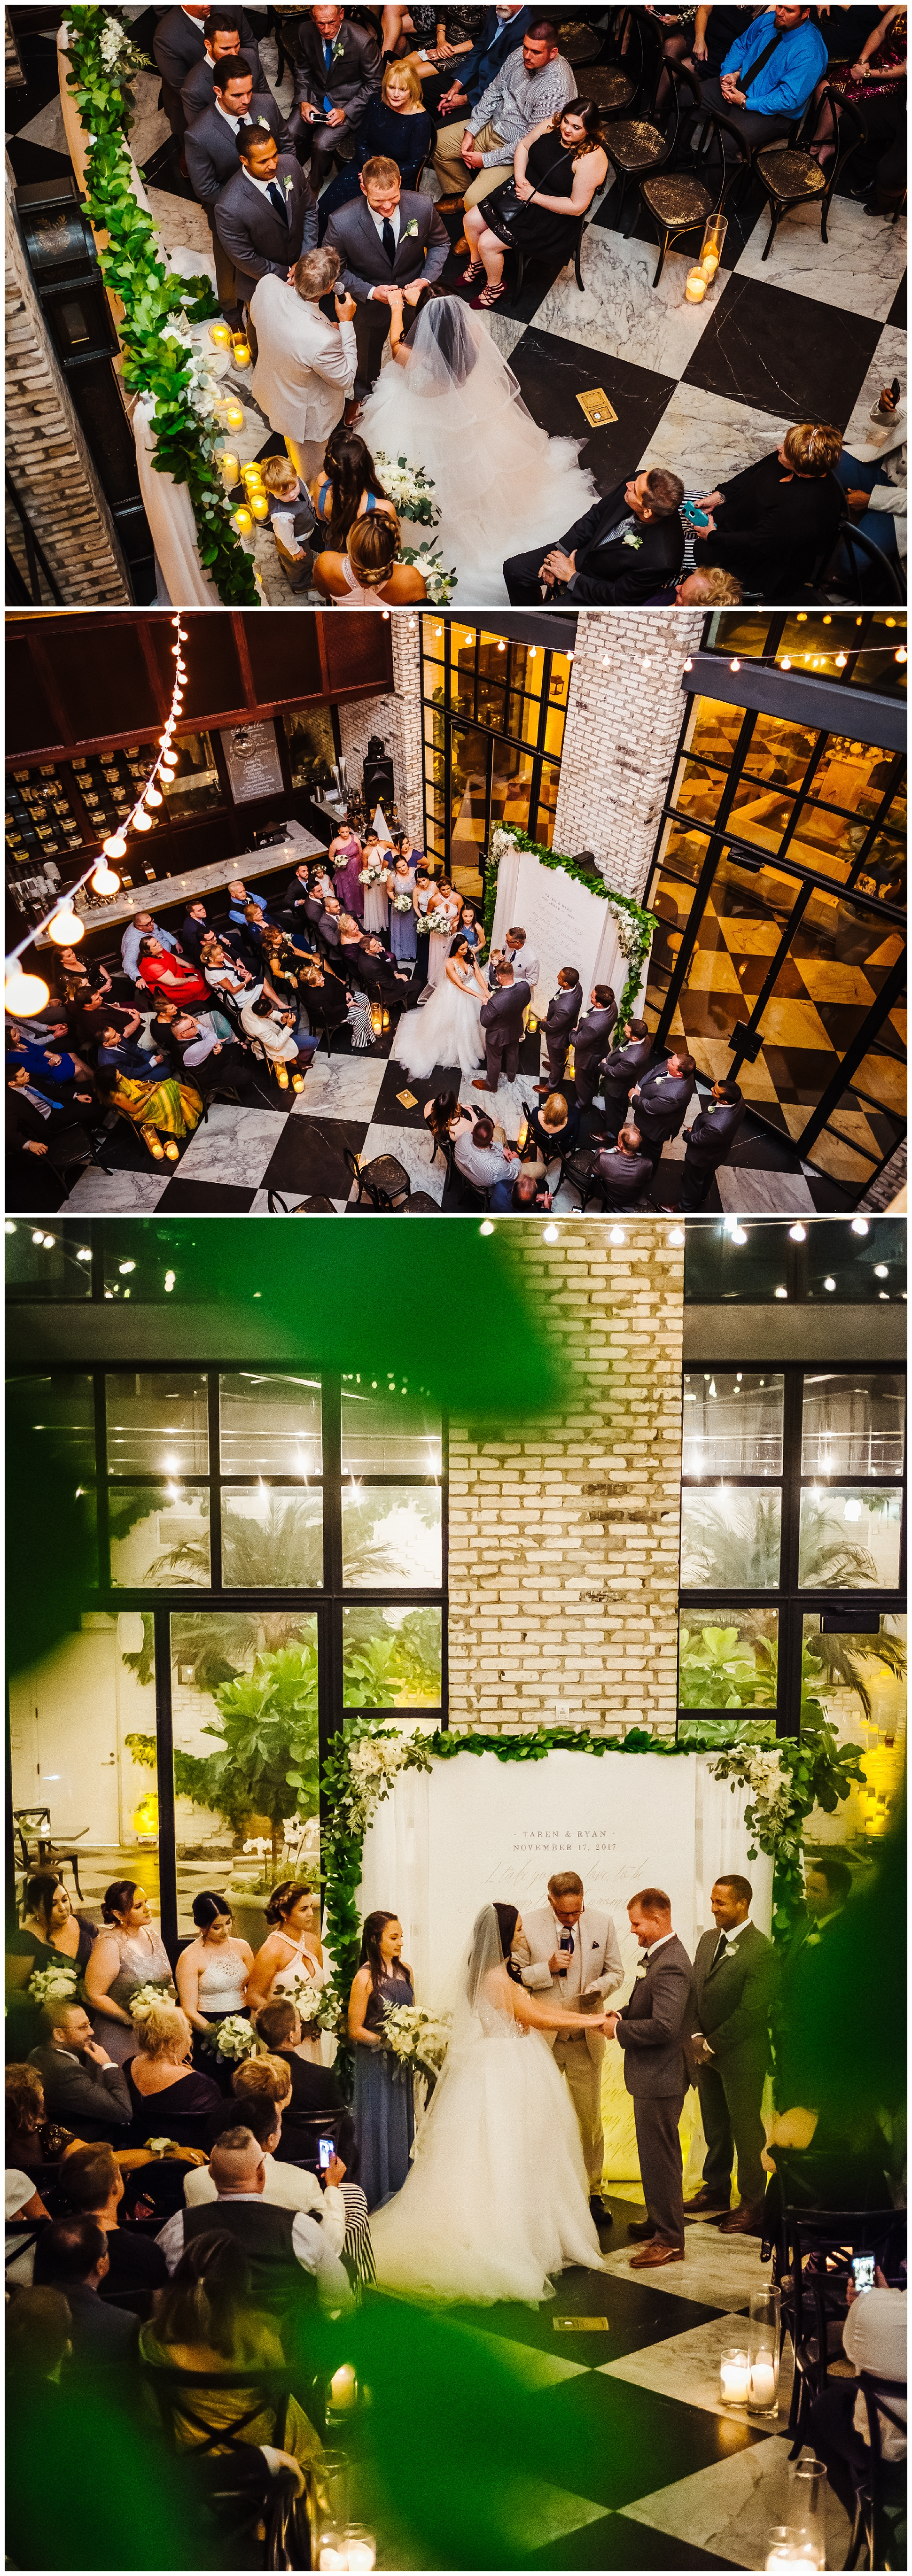 tampa-wedding-photographer-oxford-exchange-garland-candlelight-gold-hayley-paige_0046.jpg